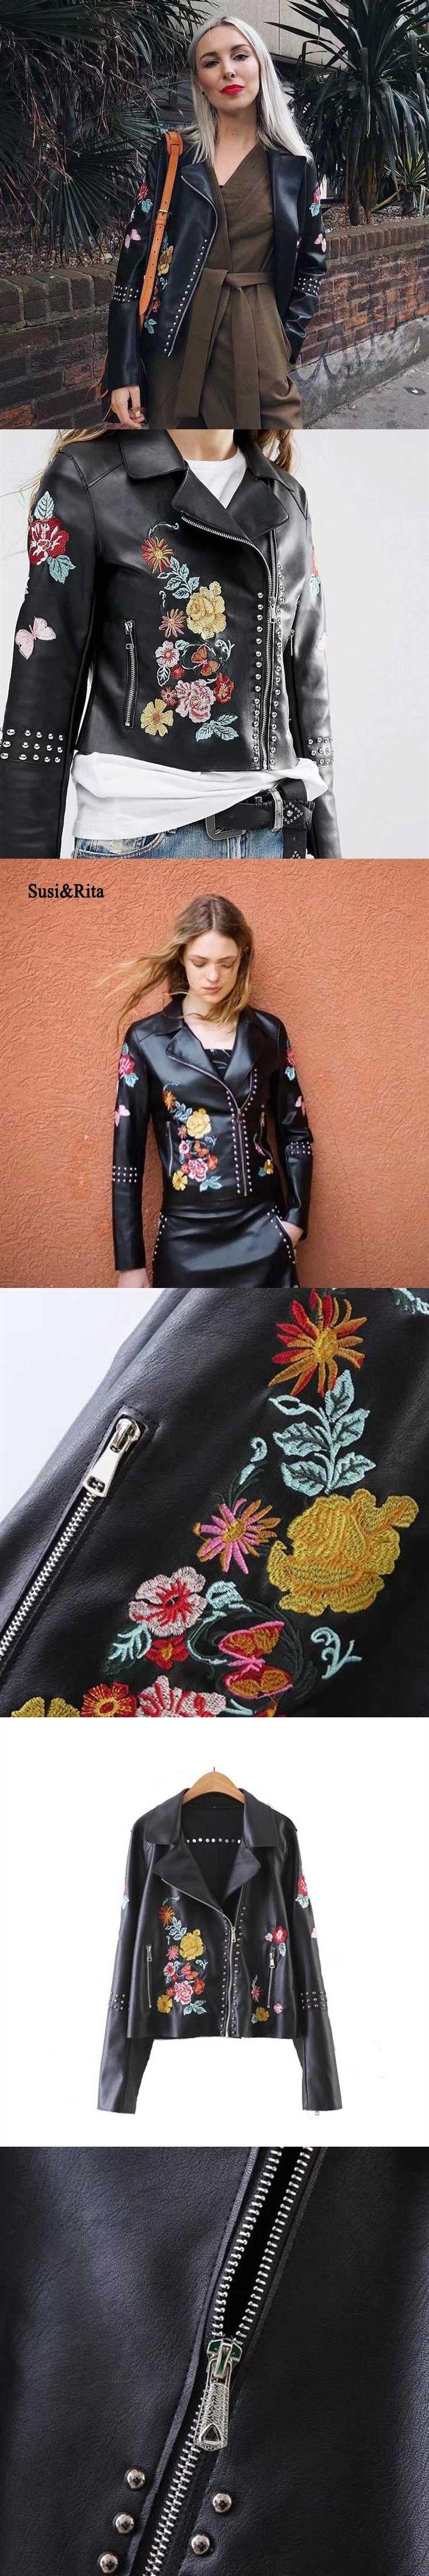 Susi&Rita Winter Leather Jacket Women 2017 Embroidery Black Leather Jackets Female Motorcycle Short Pu Jacket Coat Jaqueta